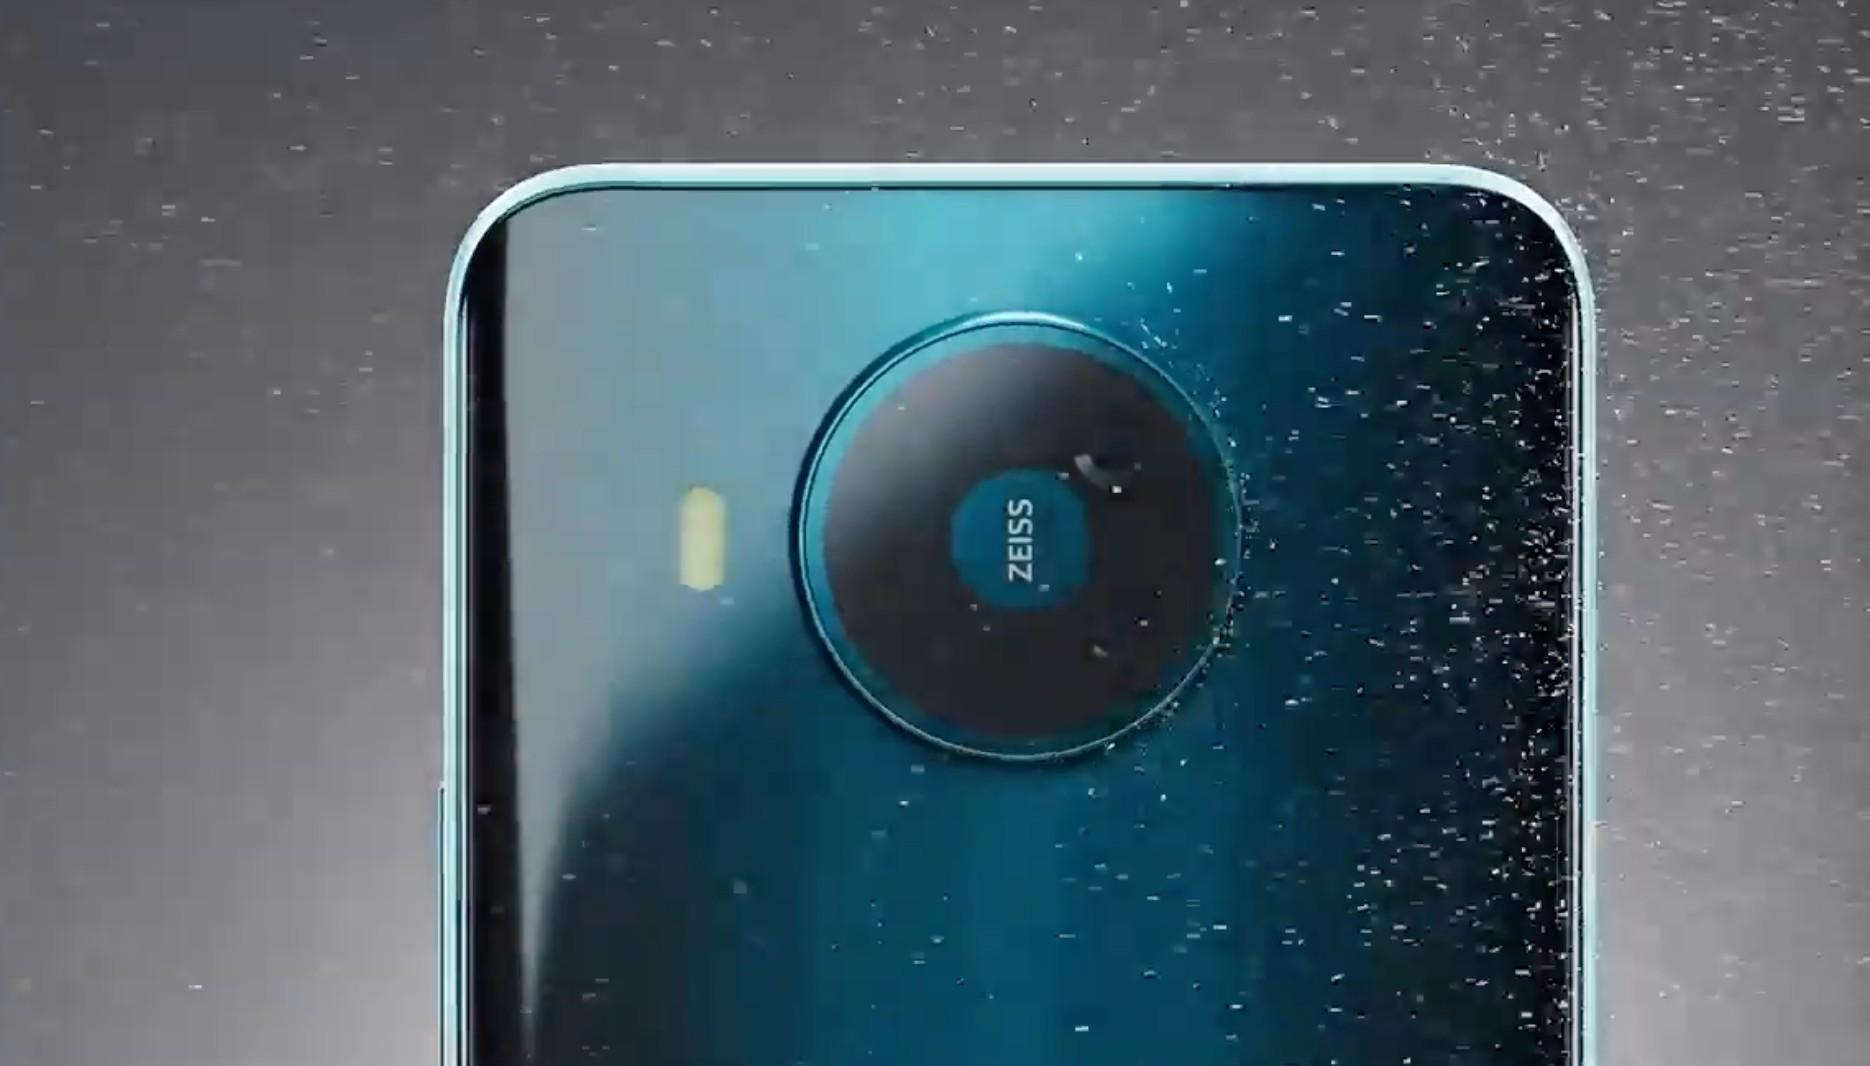 Nokia 8.3 5G ، الرائد وفقًا لـ HMD 1